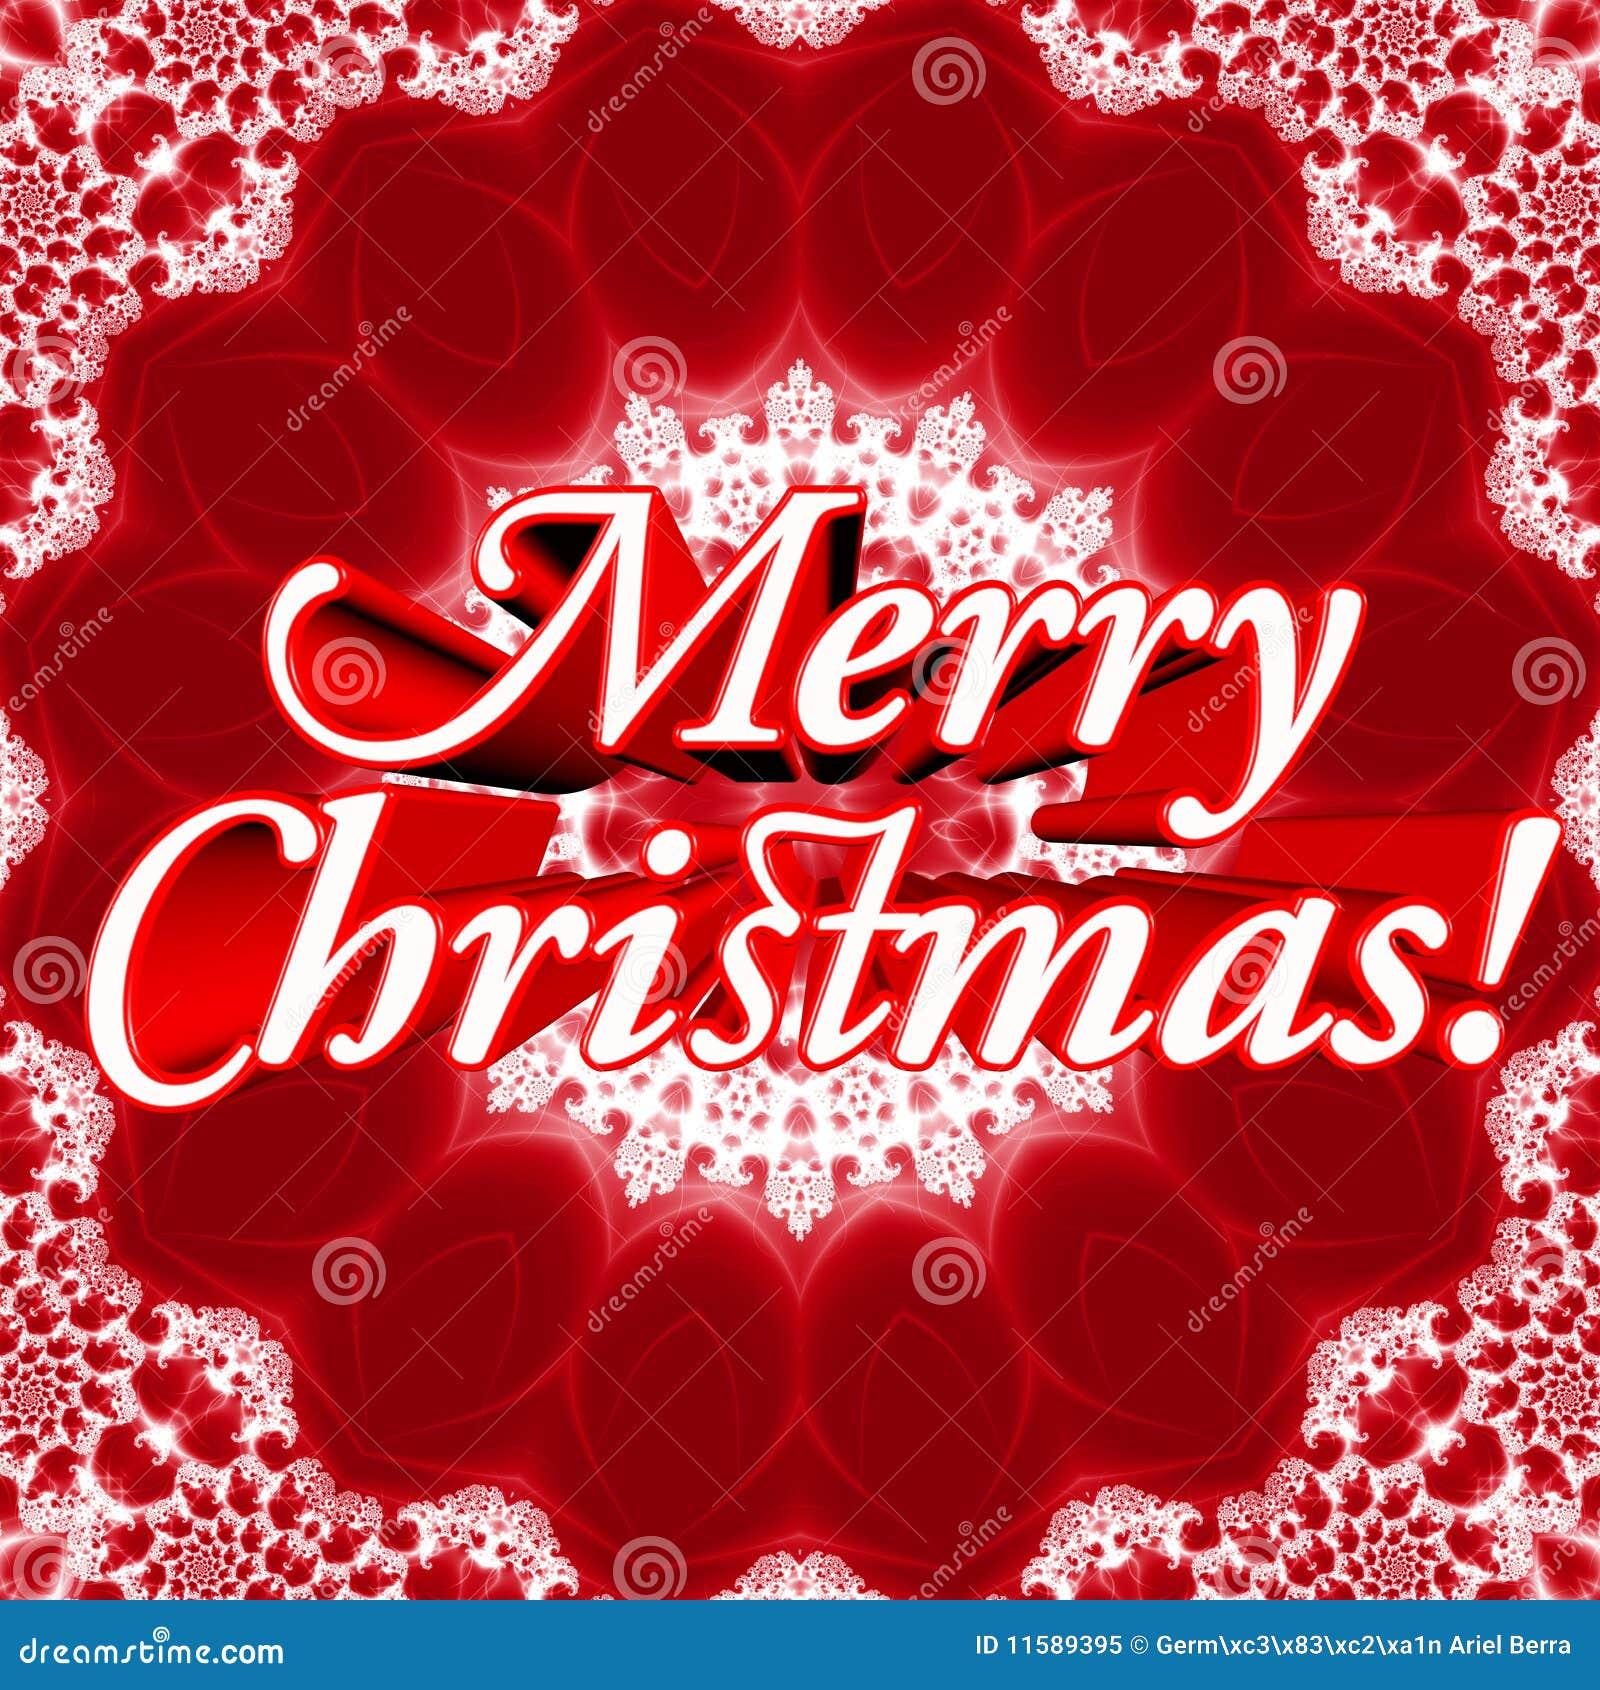 Christmas Signs Merry Christmas Sign Royalty Free Stock Photo Image 11589395